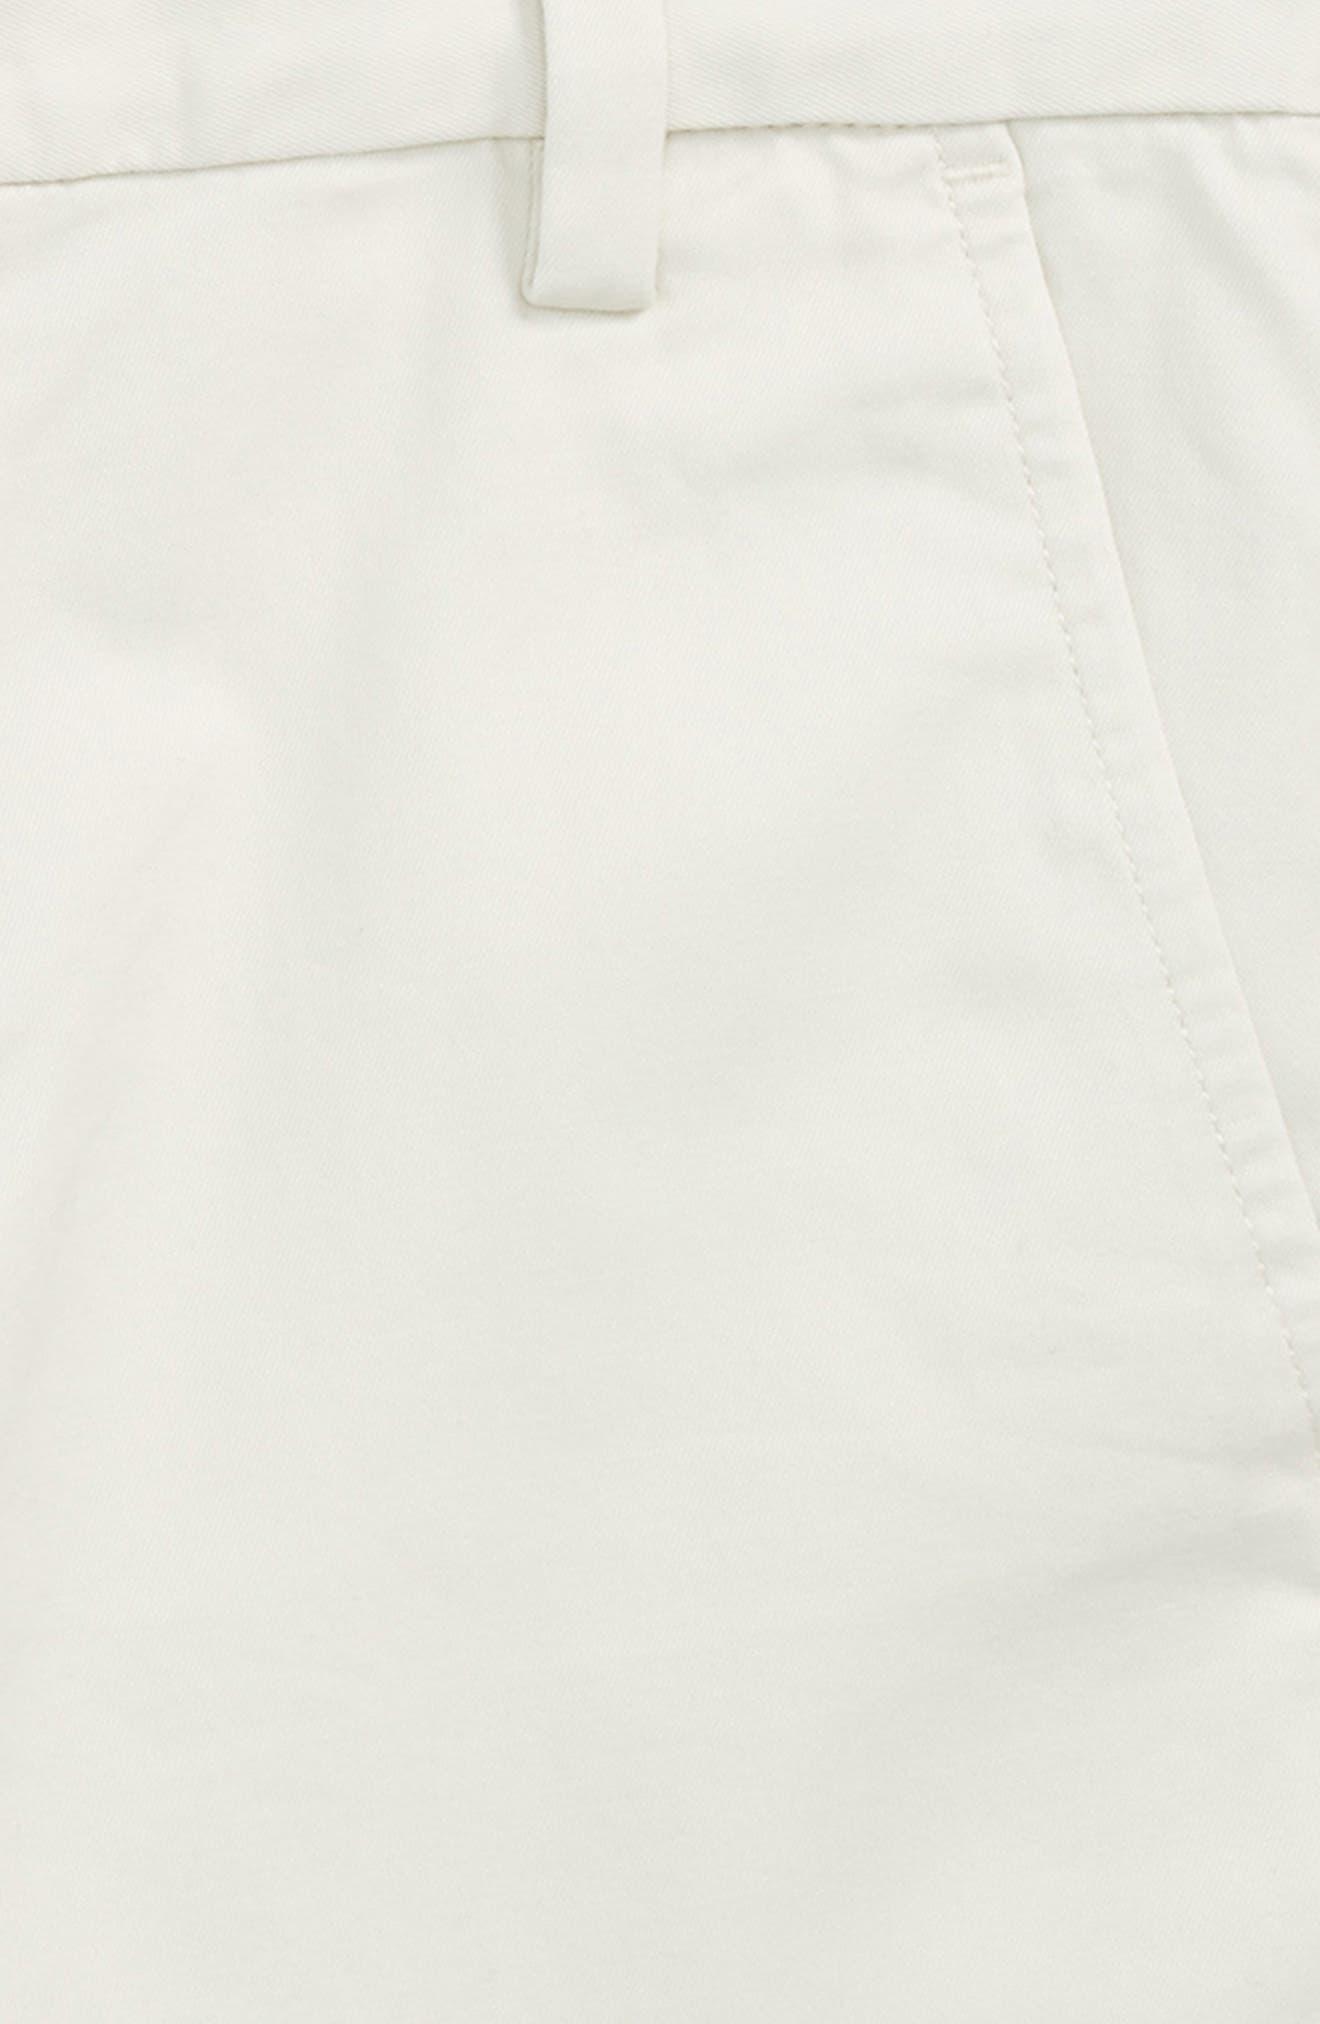 Stretch Breaker Shorts,                             Alternate thumbnail 2, color,                             STONE